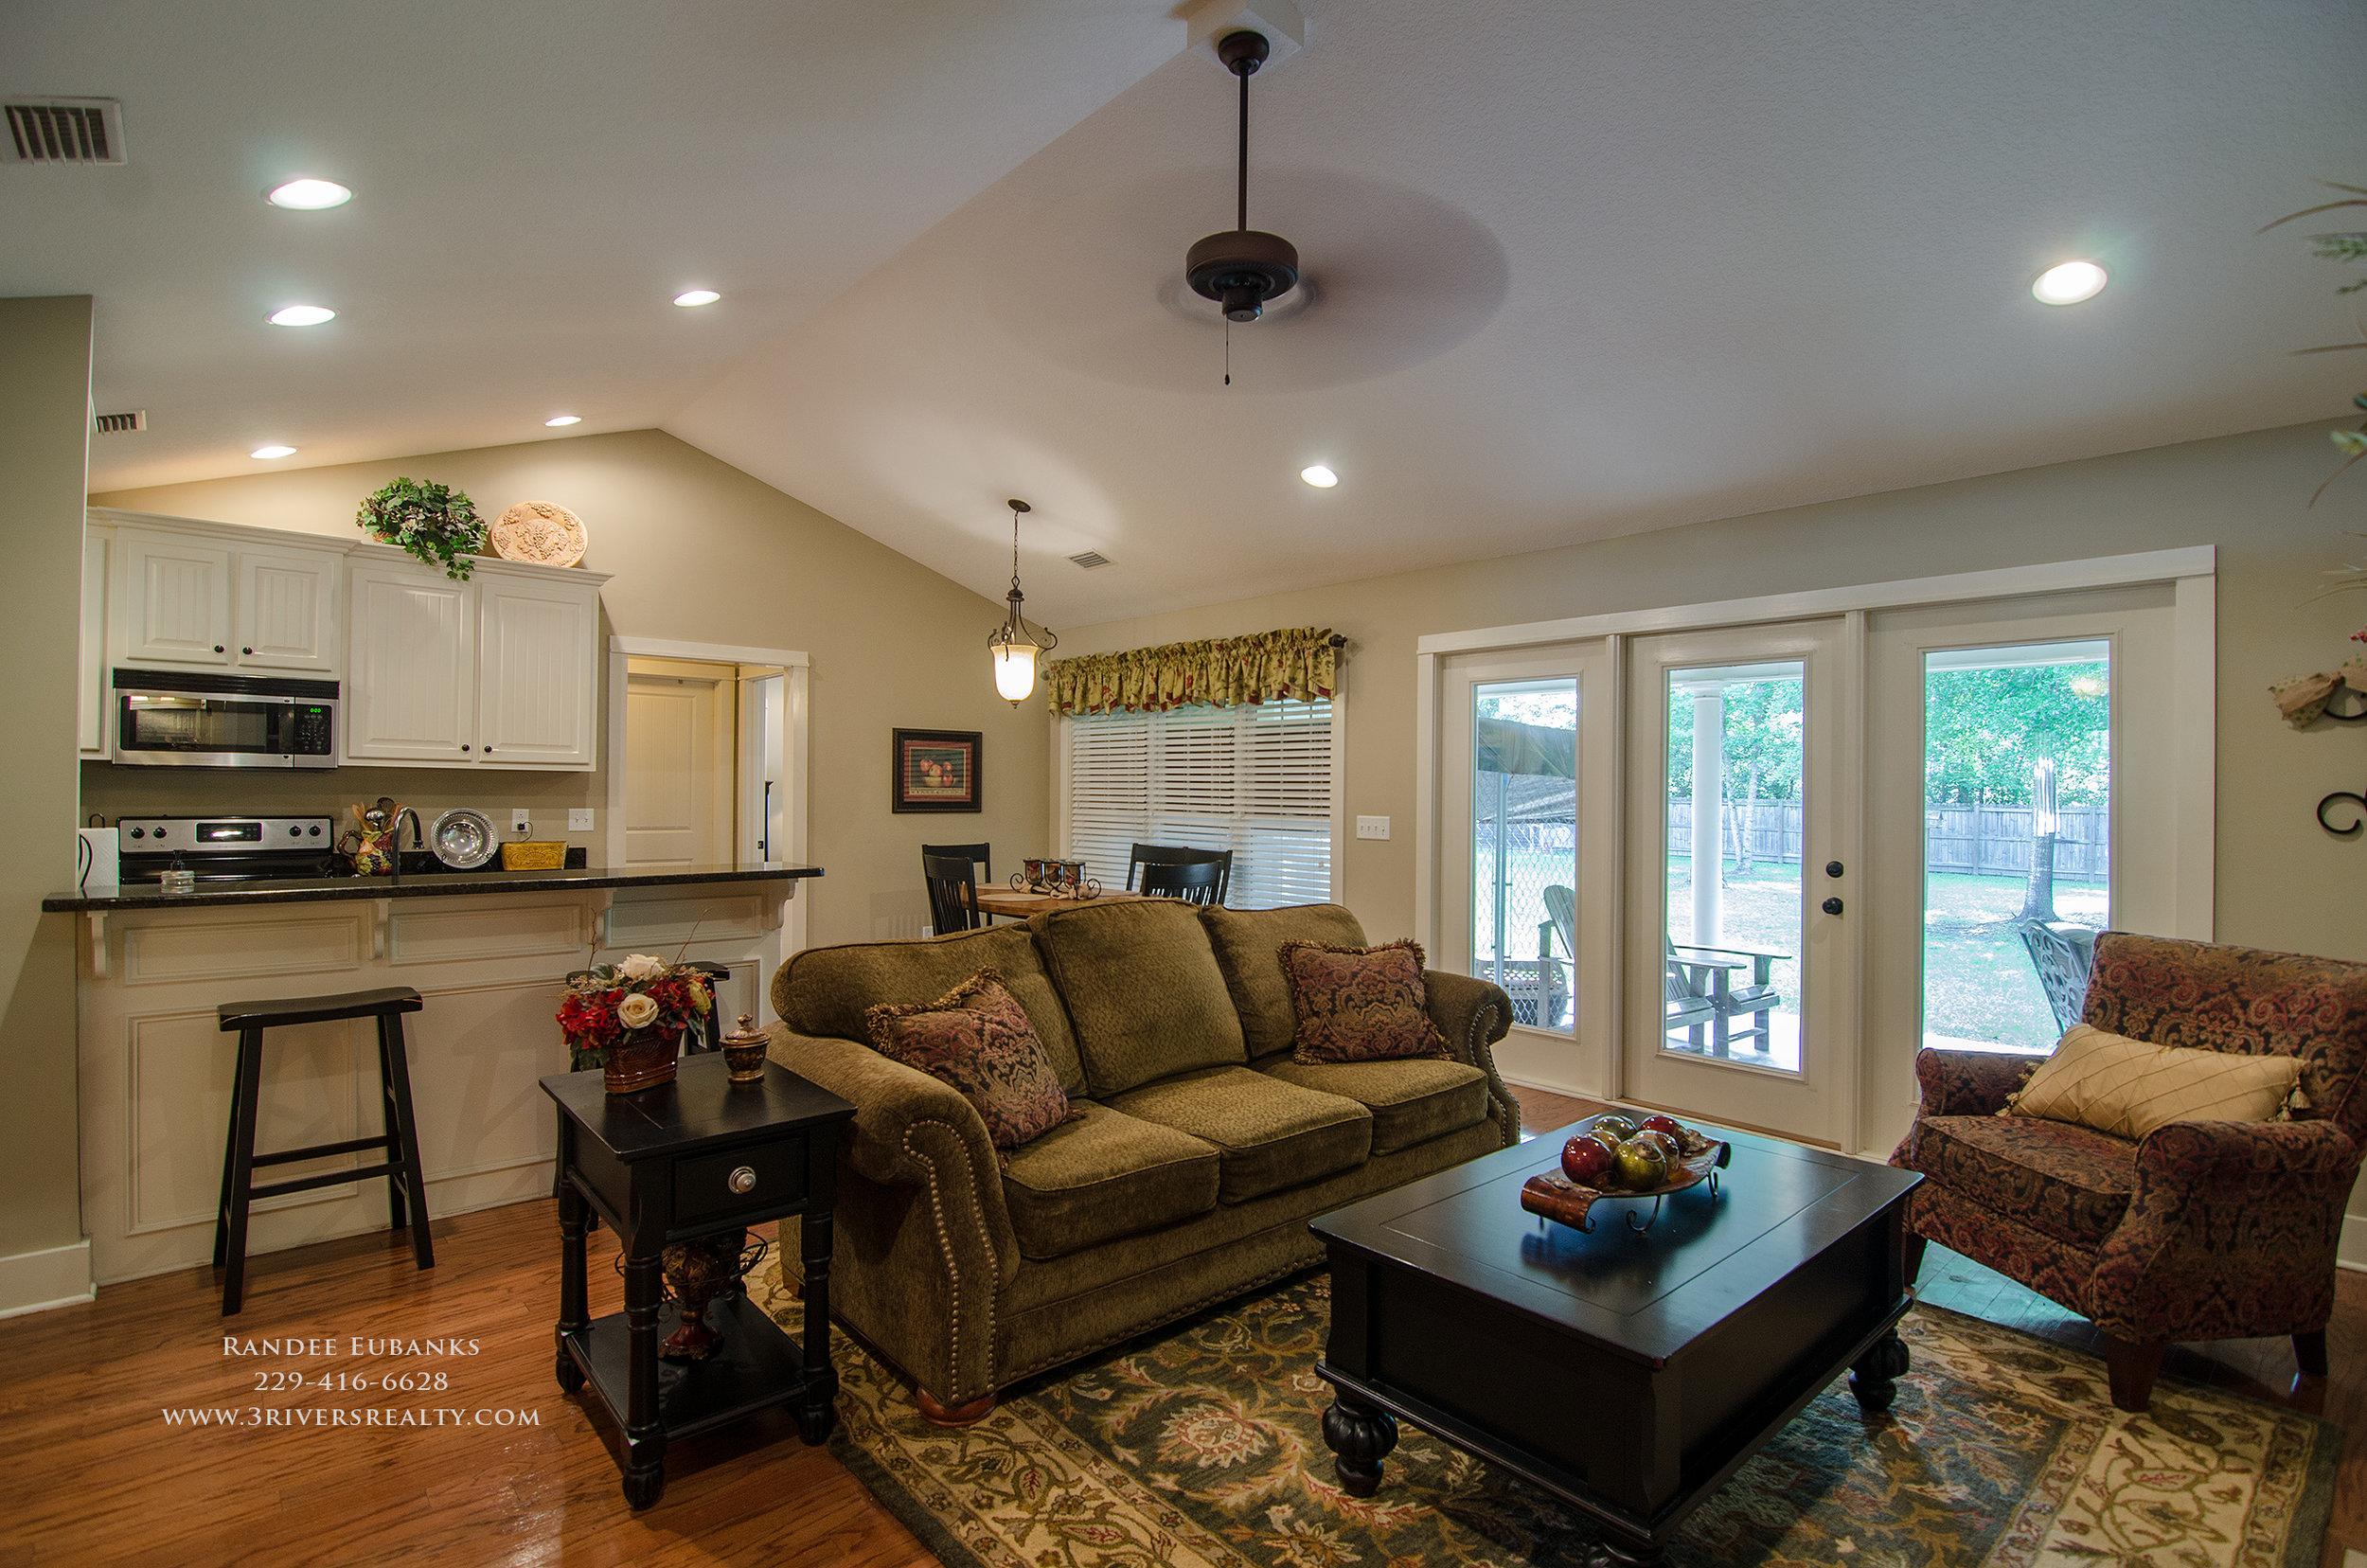 3riversrealty_bainbridge-georgia-home-for-sale_3-bed-2-bath_outdoor-fireplace_three-rivers-realty_mills-brock_TaurusUSA_pool_back-porch-fireplacae_livingroom_kitchen - Copy.jpg